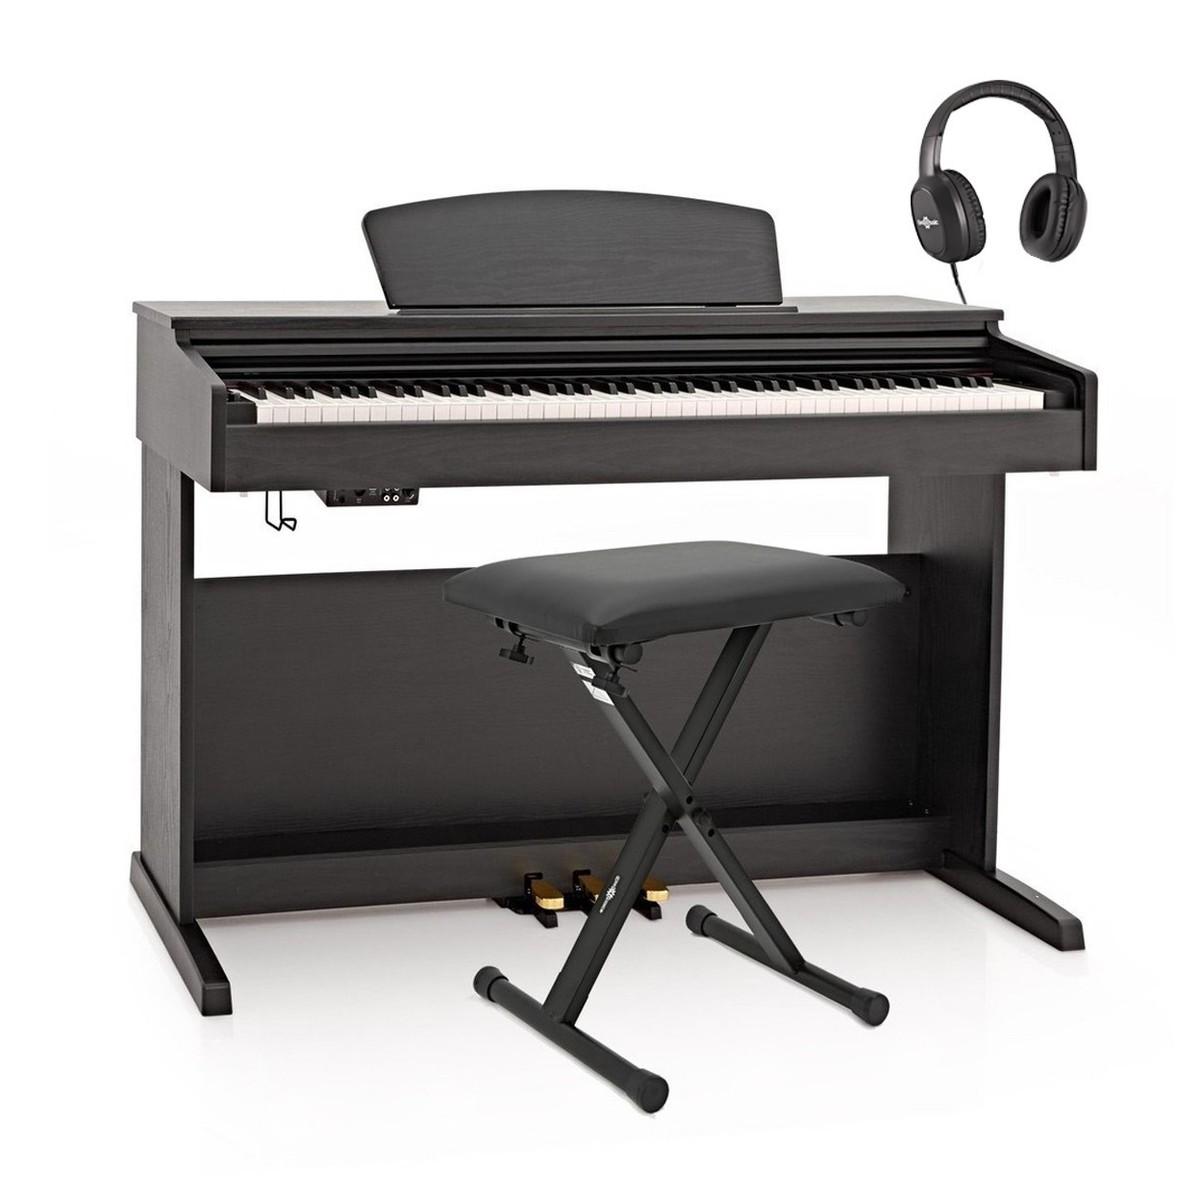 DP-10X Digital Piano by Gear4music   Accessory Pack, Matte Black